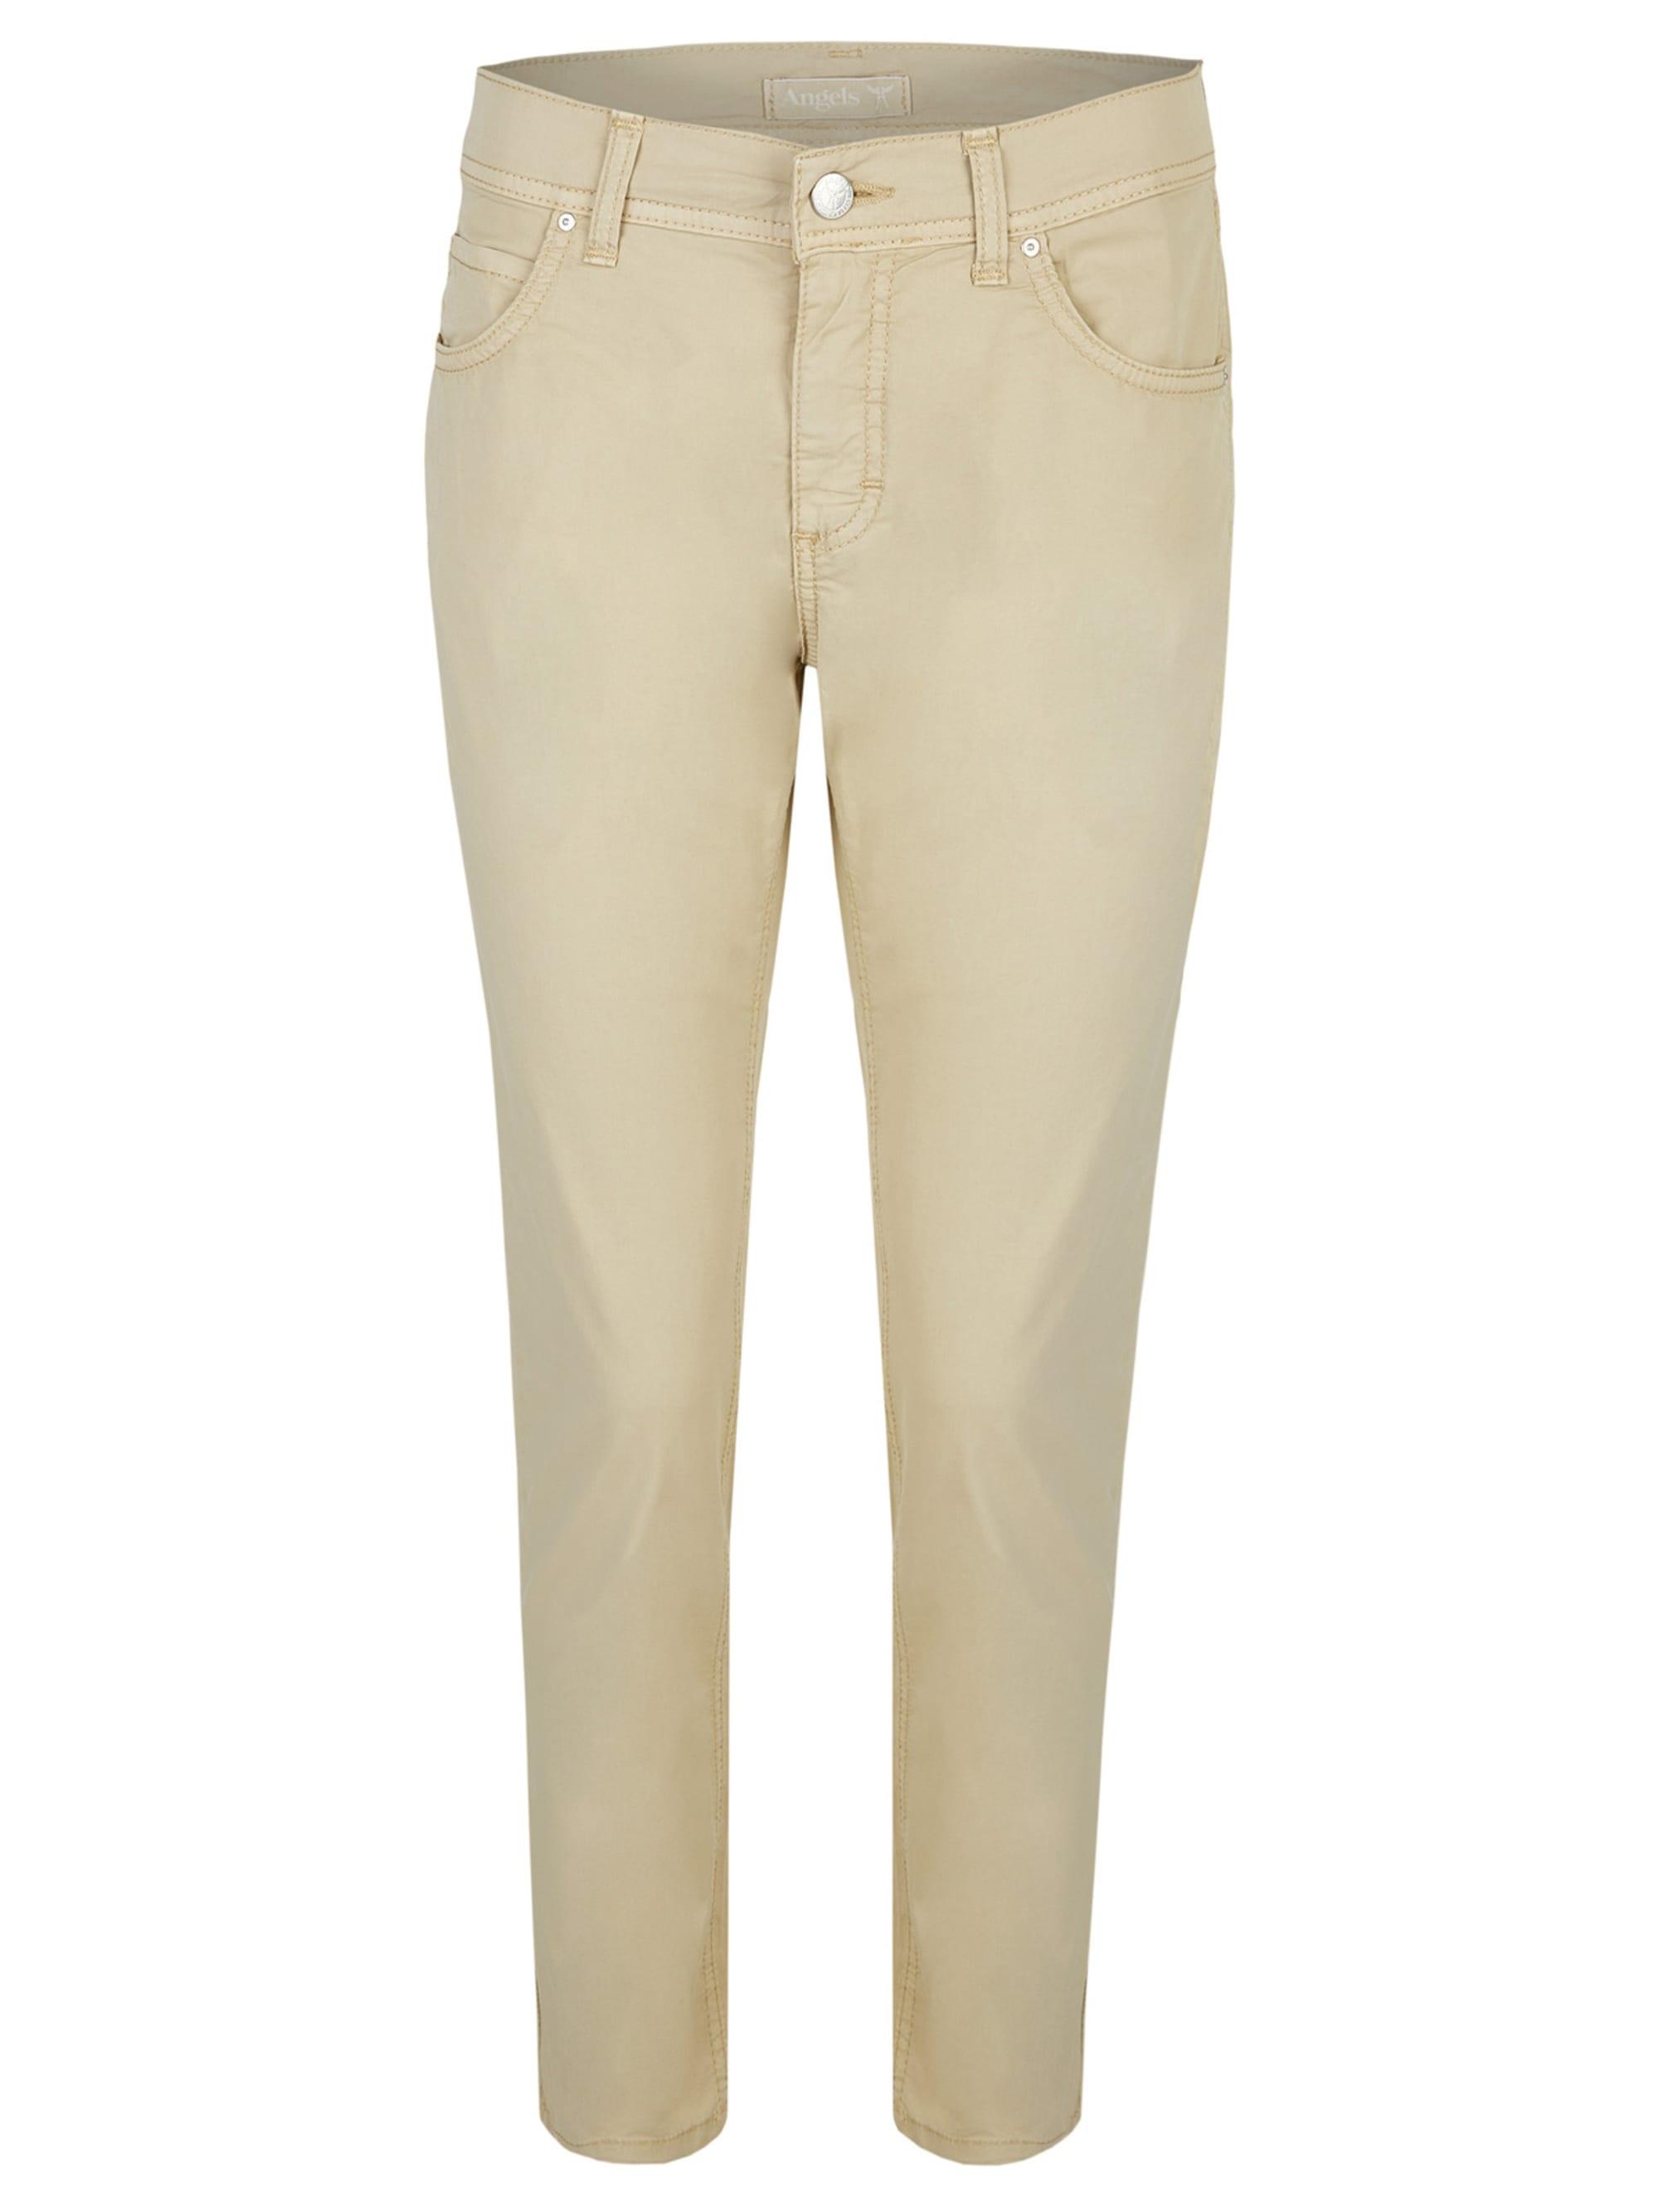 Angels Jeans 'Ornella' in unifarbenem Design w5z1C OOSyQ